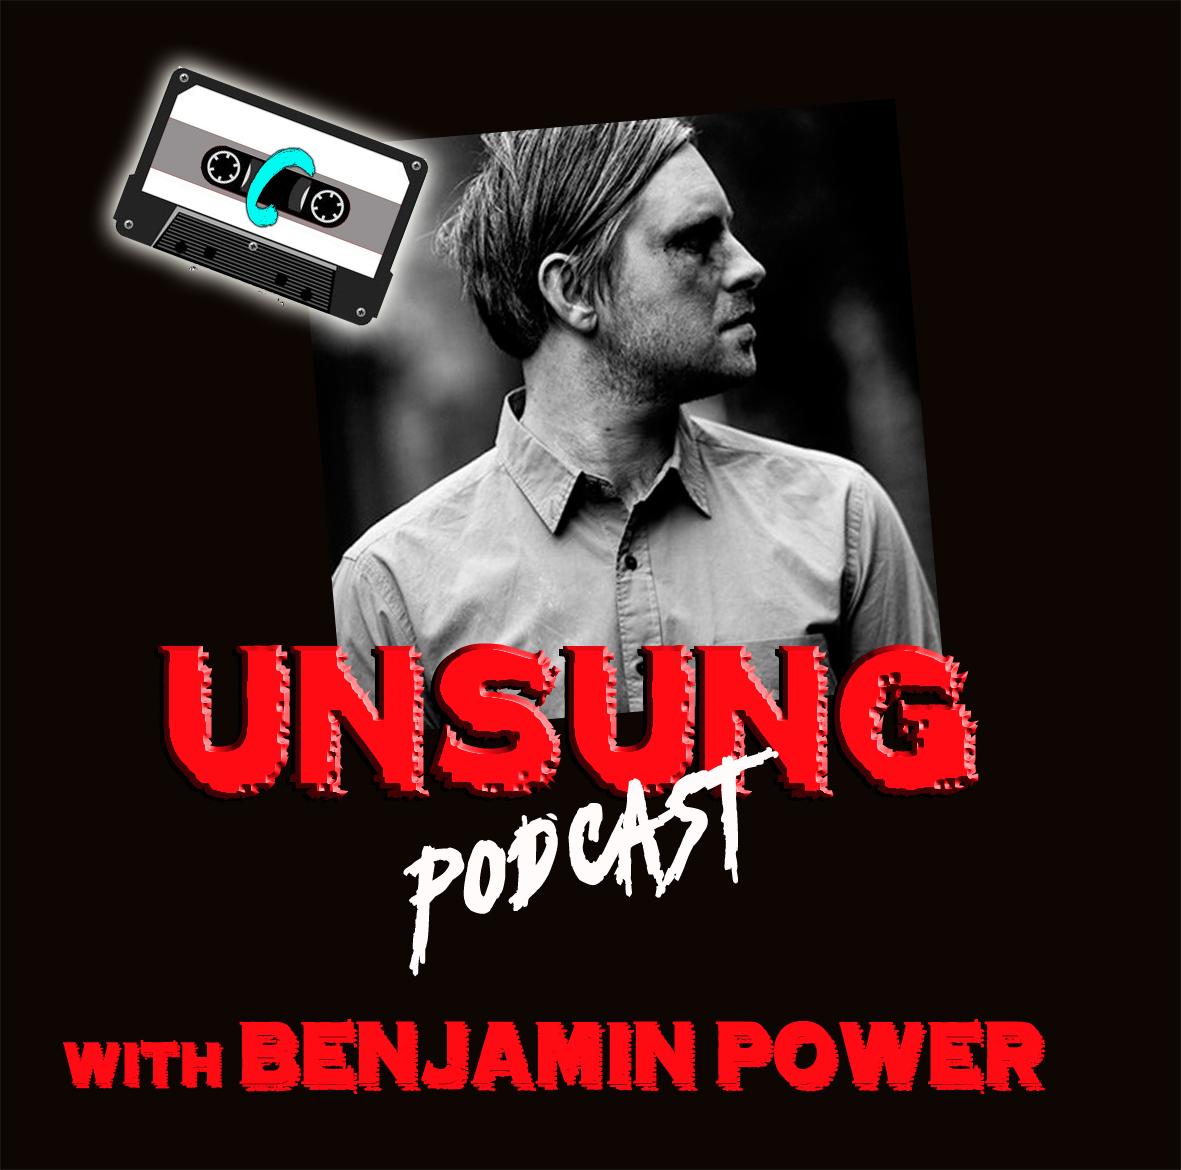 BEN POWER side C avatar copy.jpg